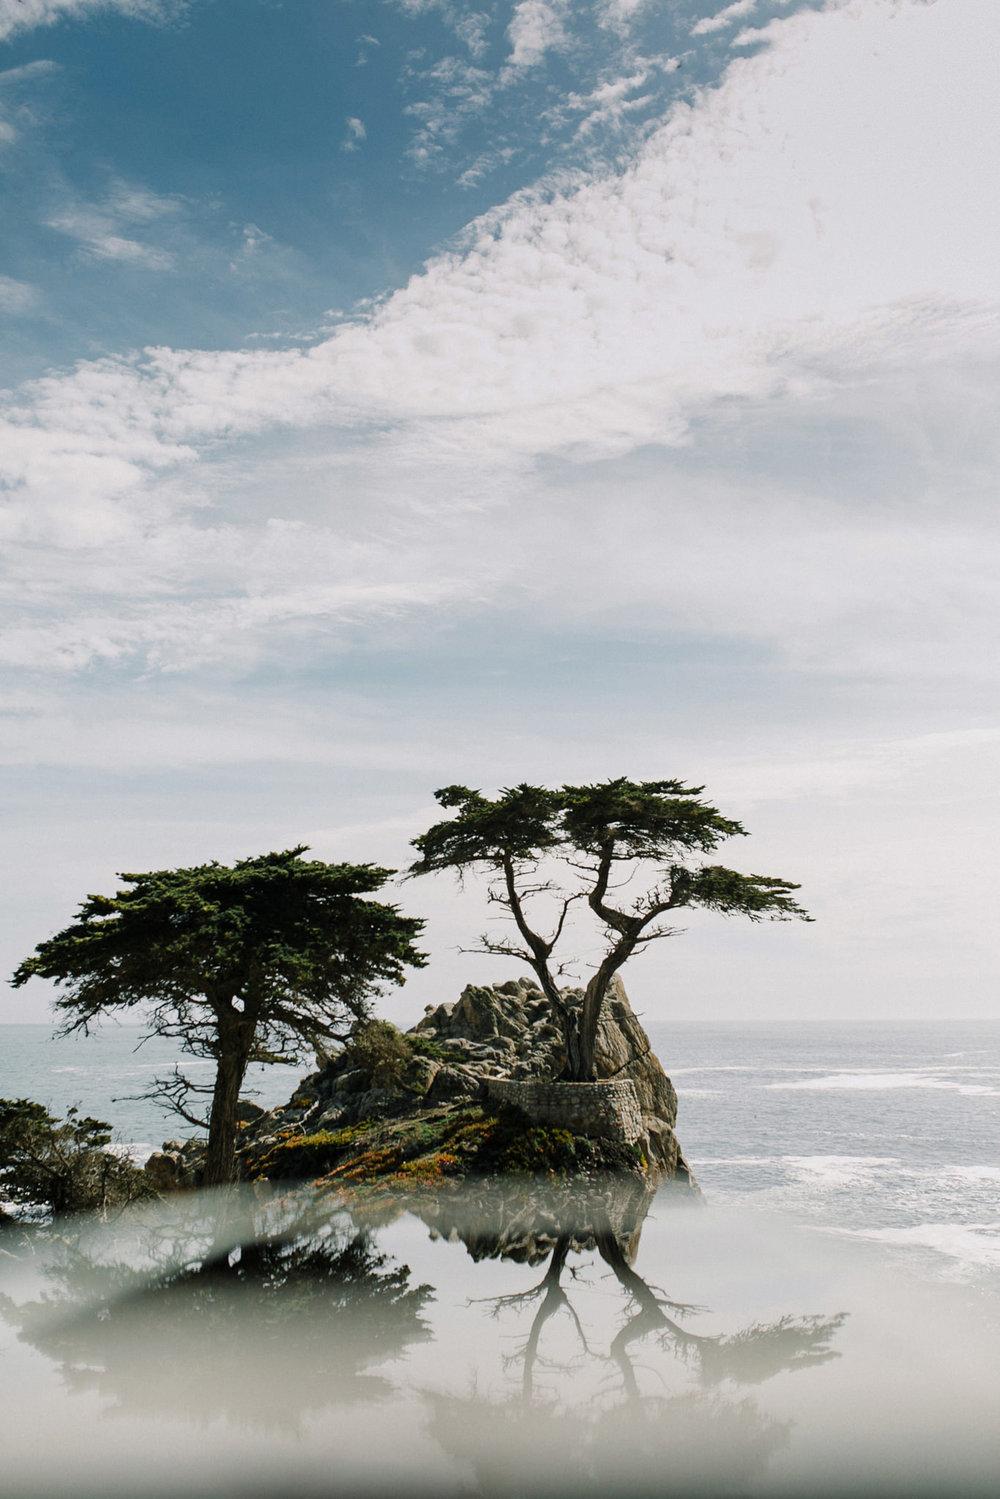 field-trip-monterrey-carmel-california-erin-aasland-25.jpg